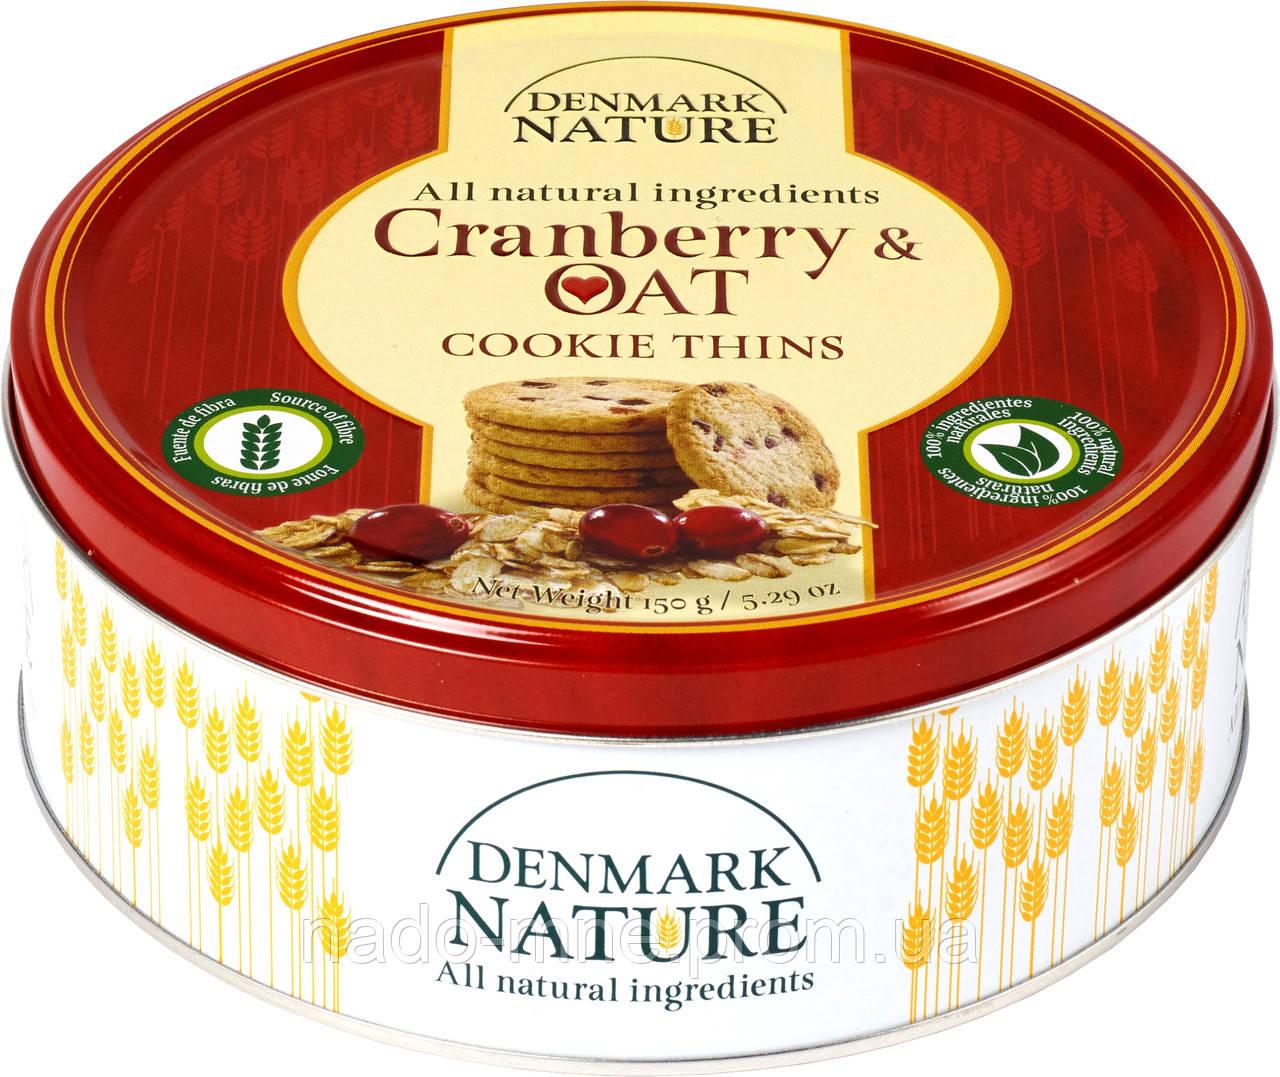 Овсяное печенье Denmark Nature Cranberry&Oat Jacobsens Bakery Ltd.,150 г